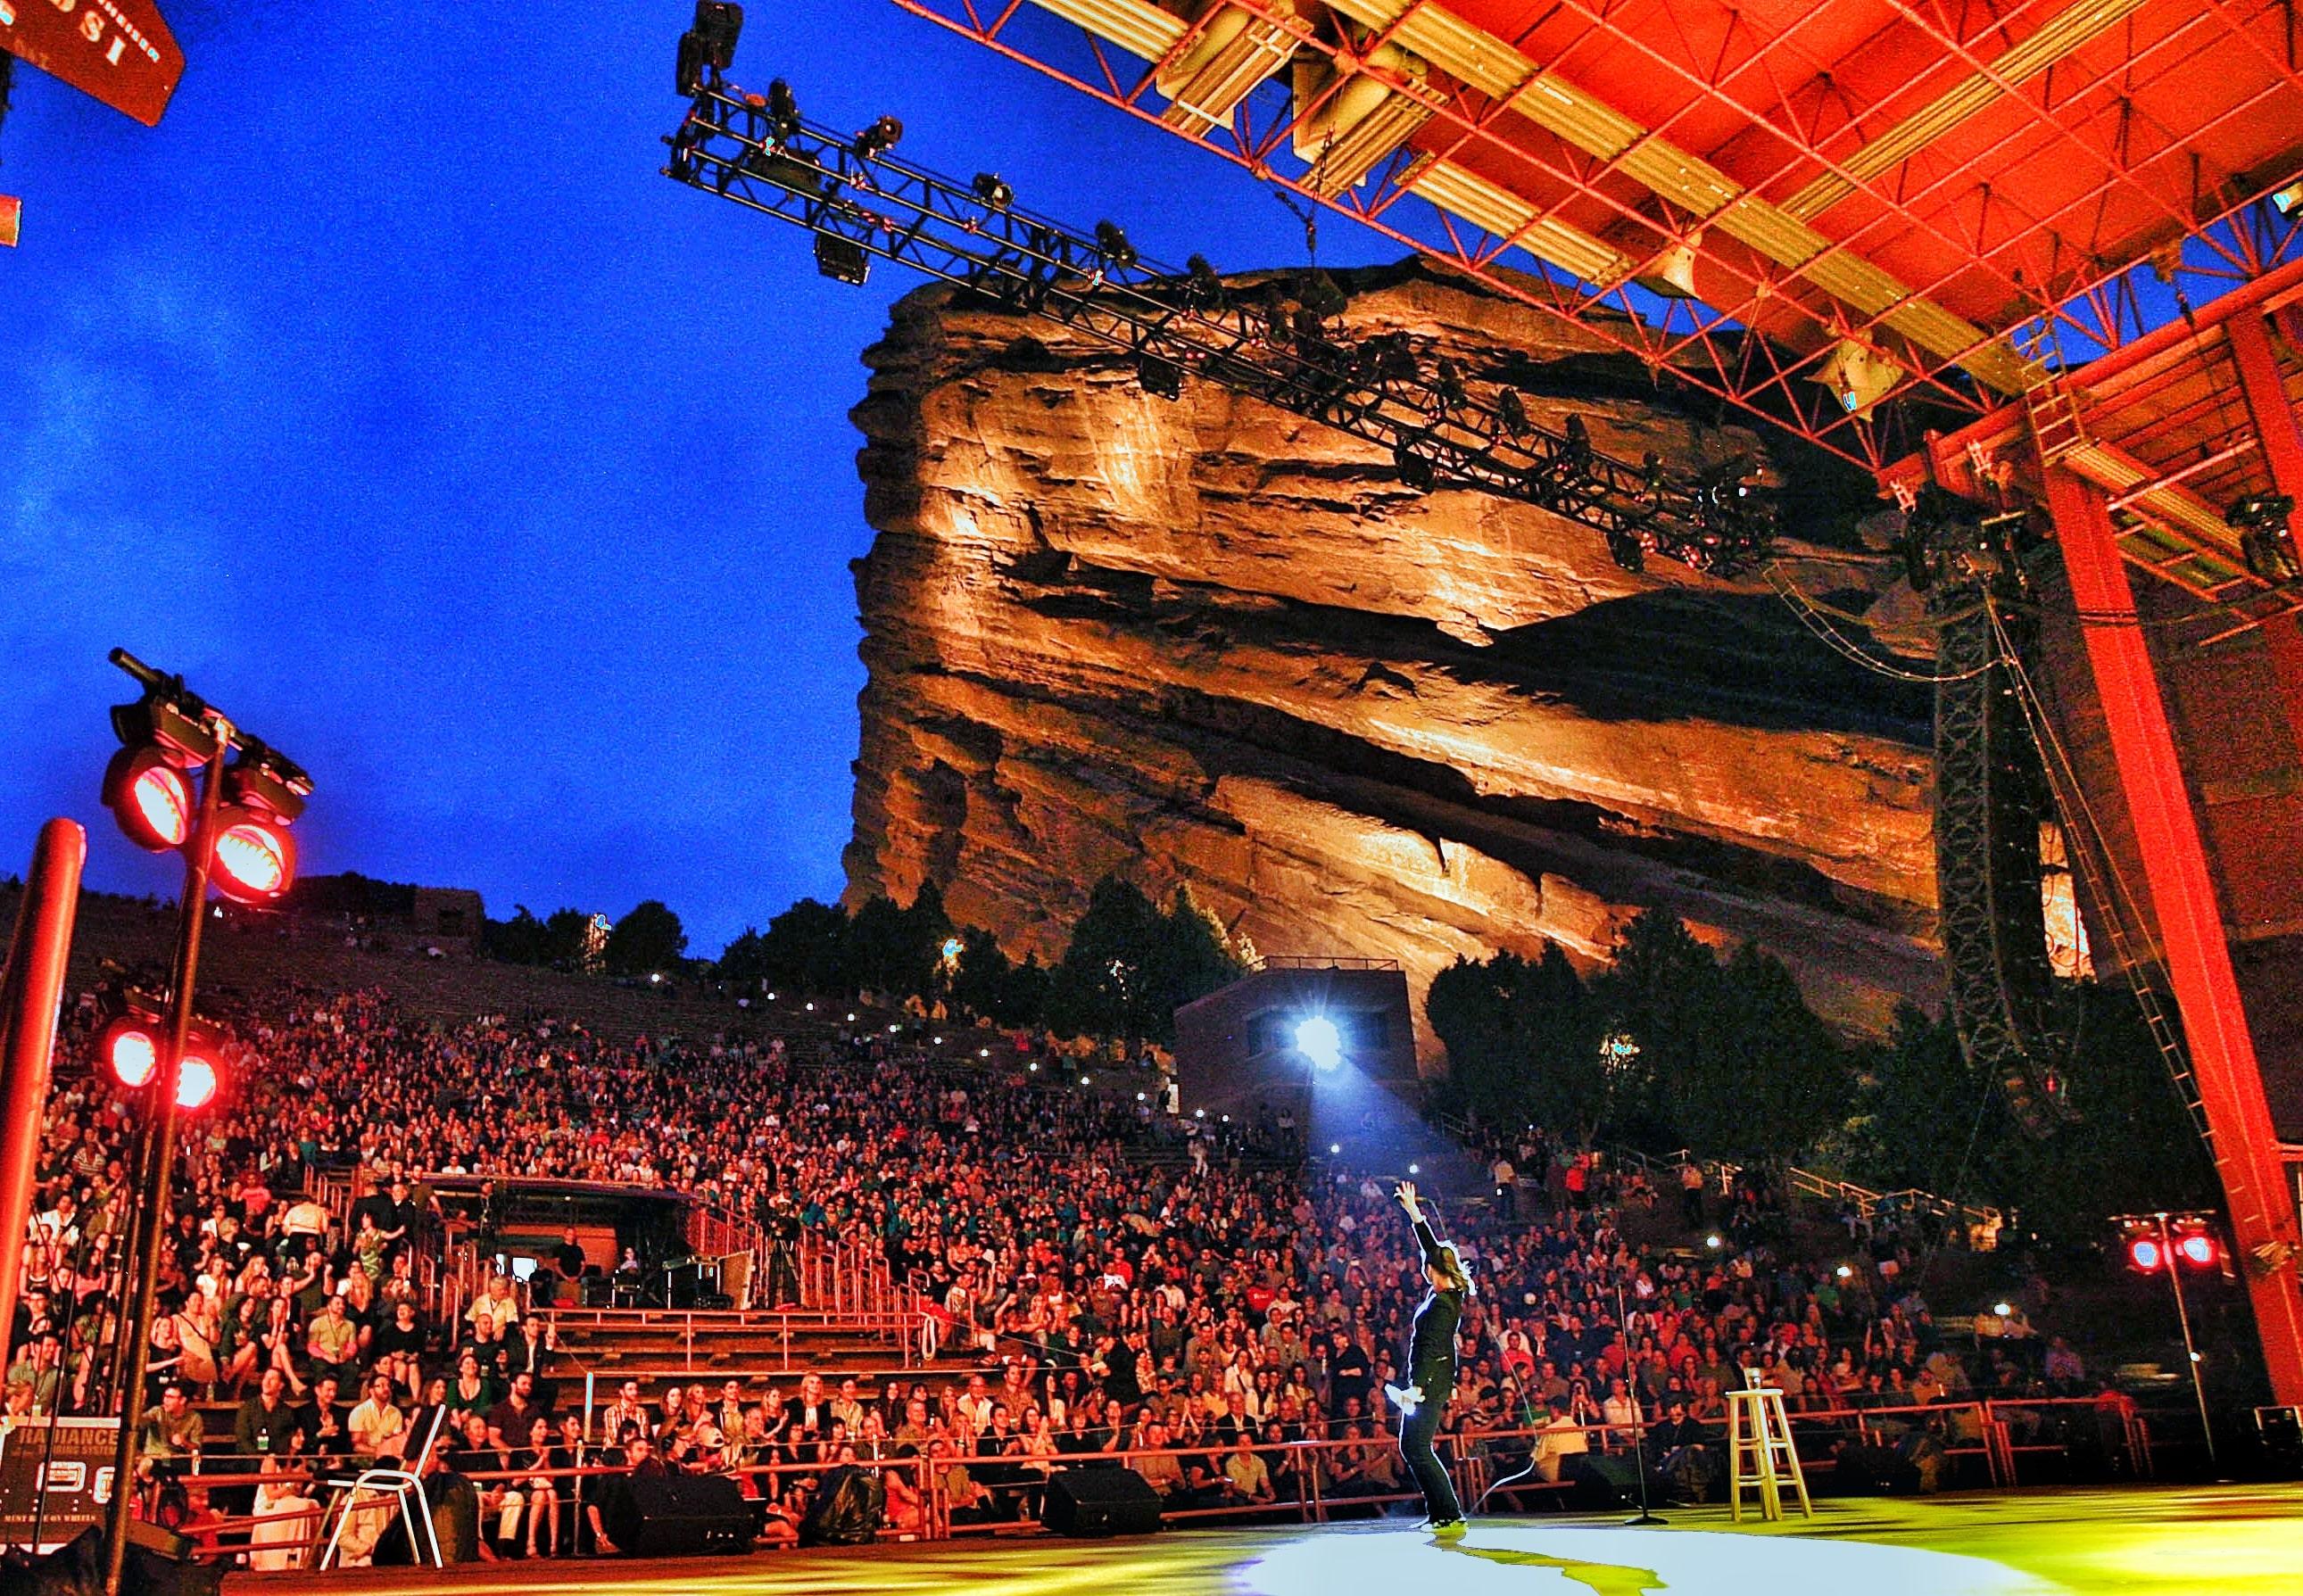 Buy Red Rocks Amphitheatre Concert Tickets For Sale Online